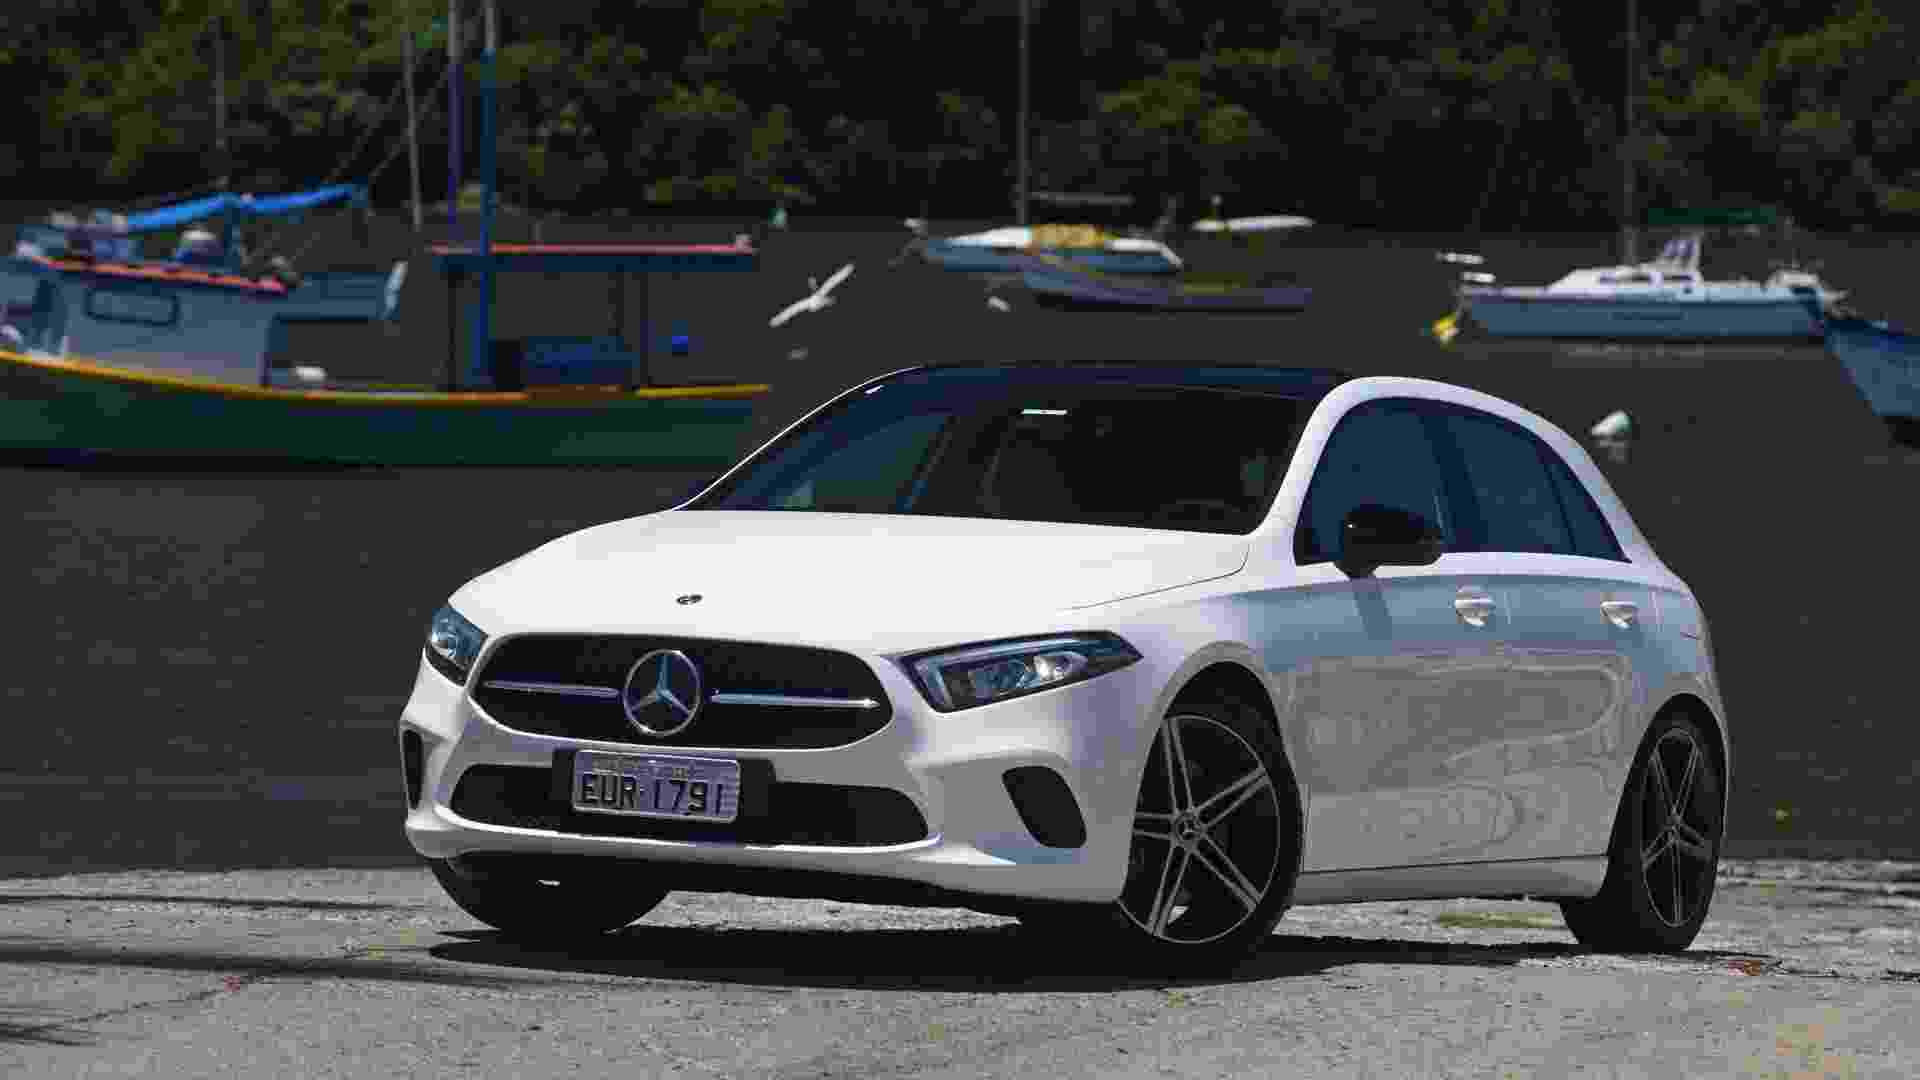 Mercedes-Benz A250 - Murilo Góes/UOL